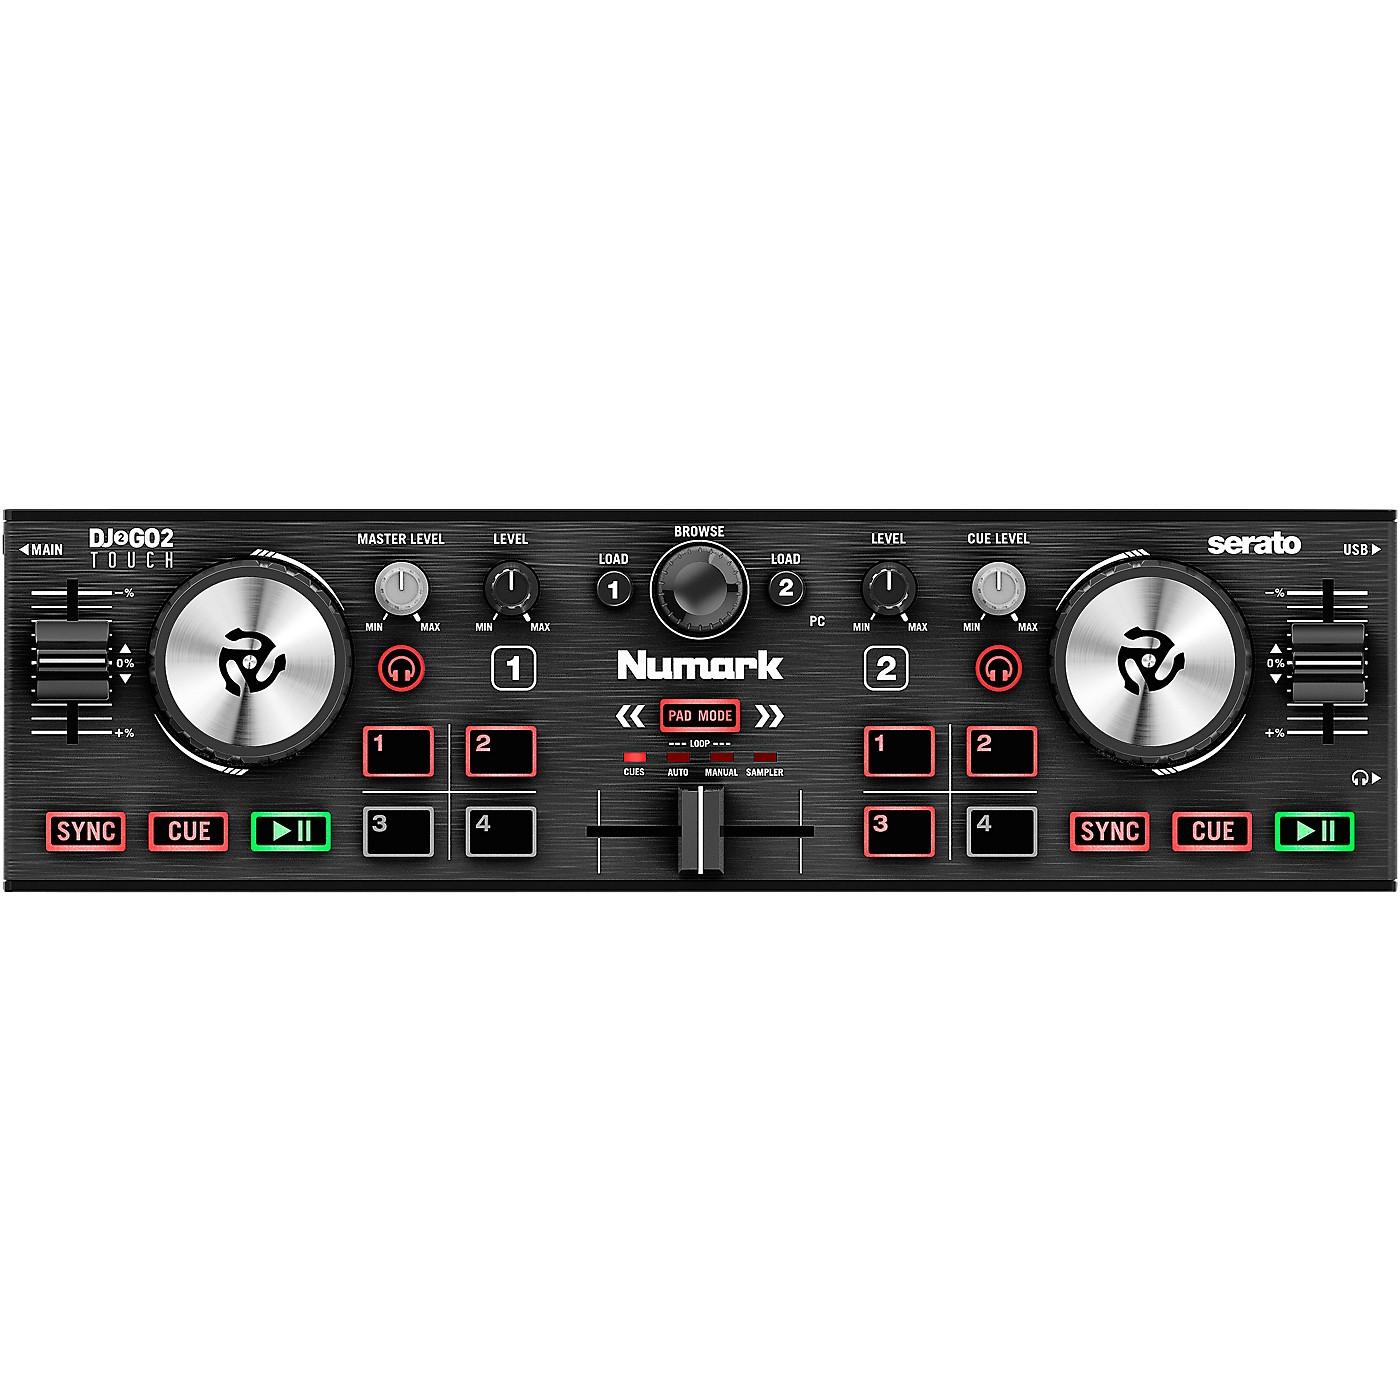 Numark DJ2GO2 Touch Pocket DJ Controller for Serato thumbnail